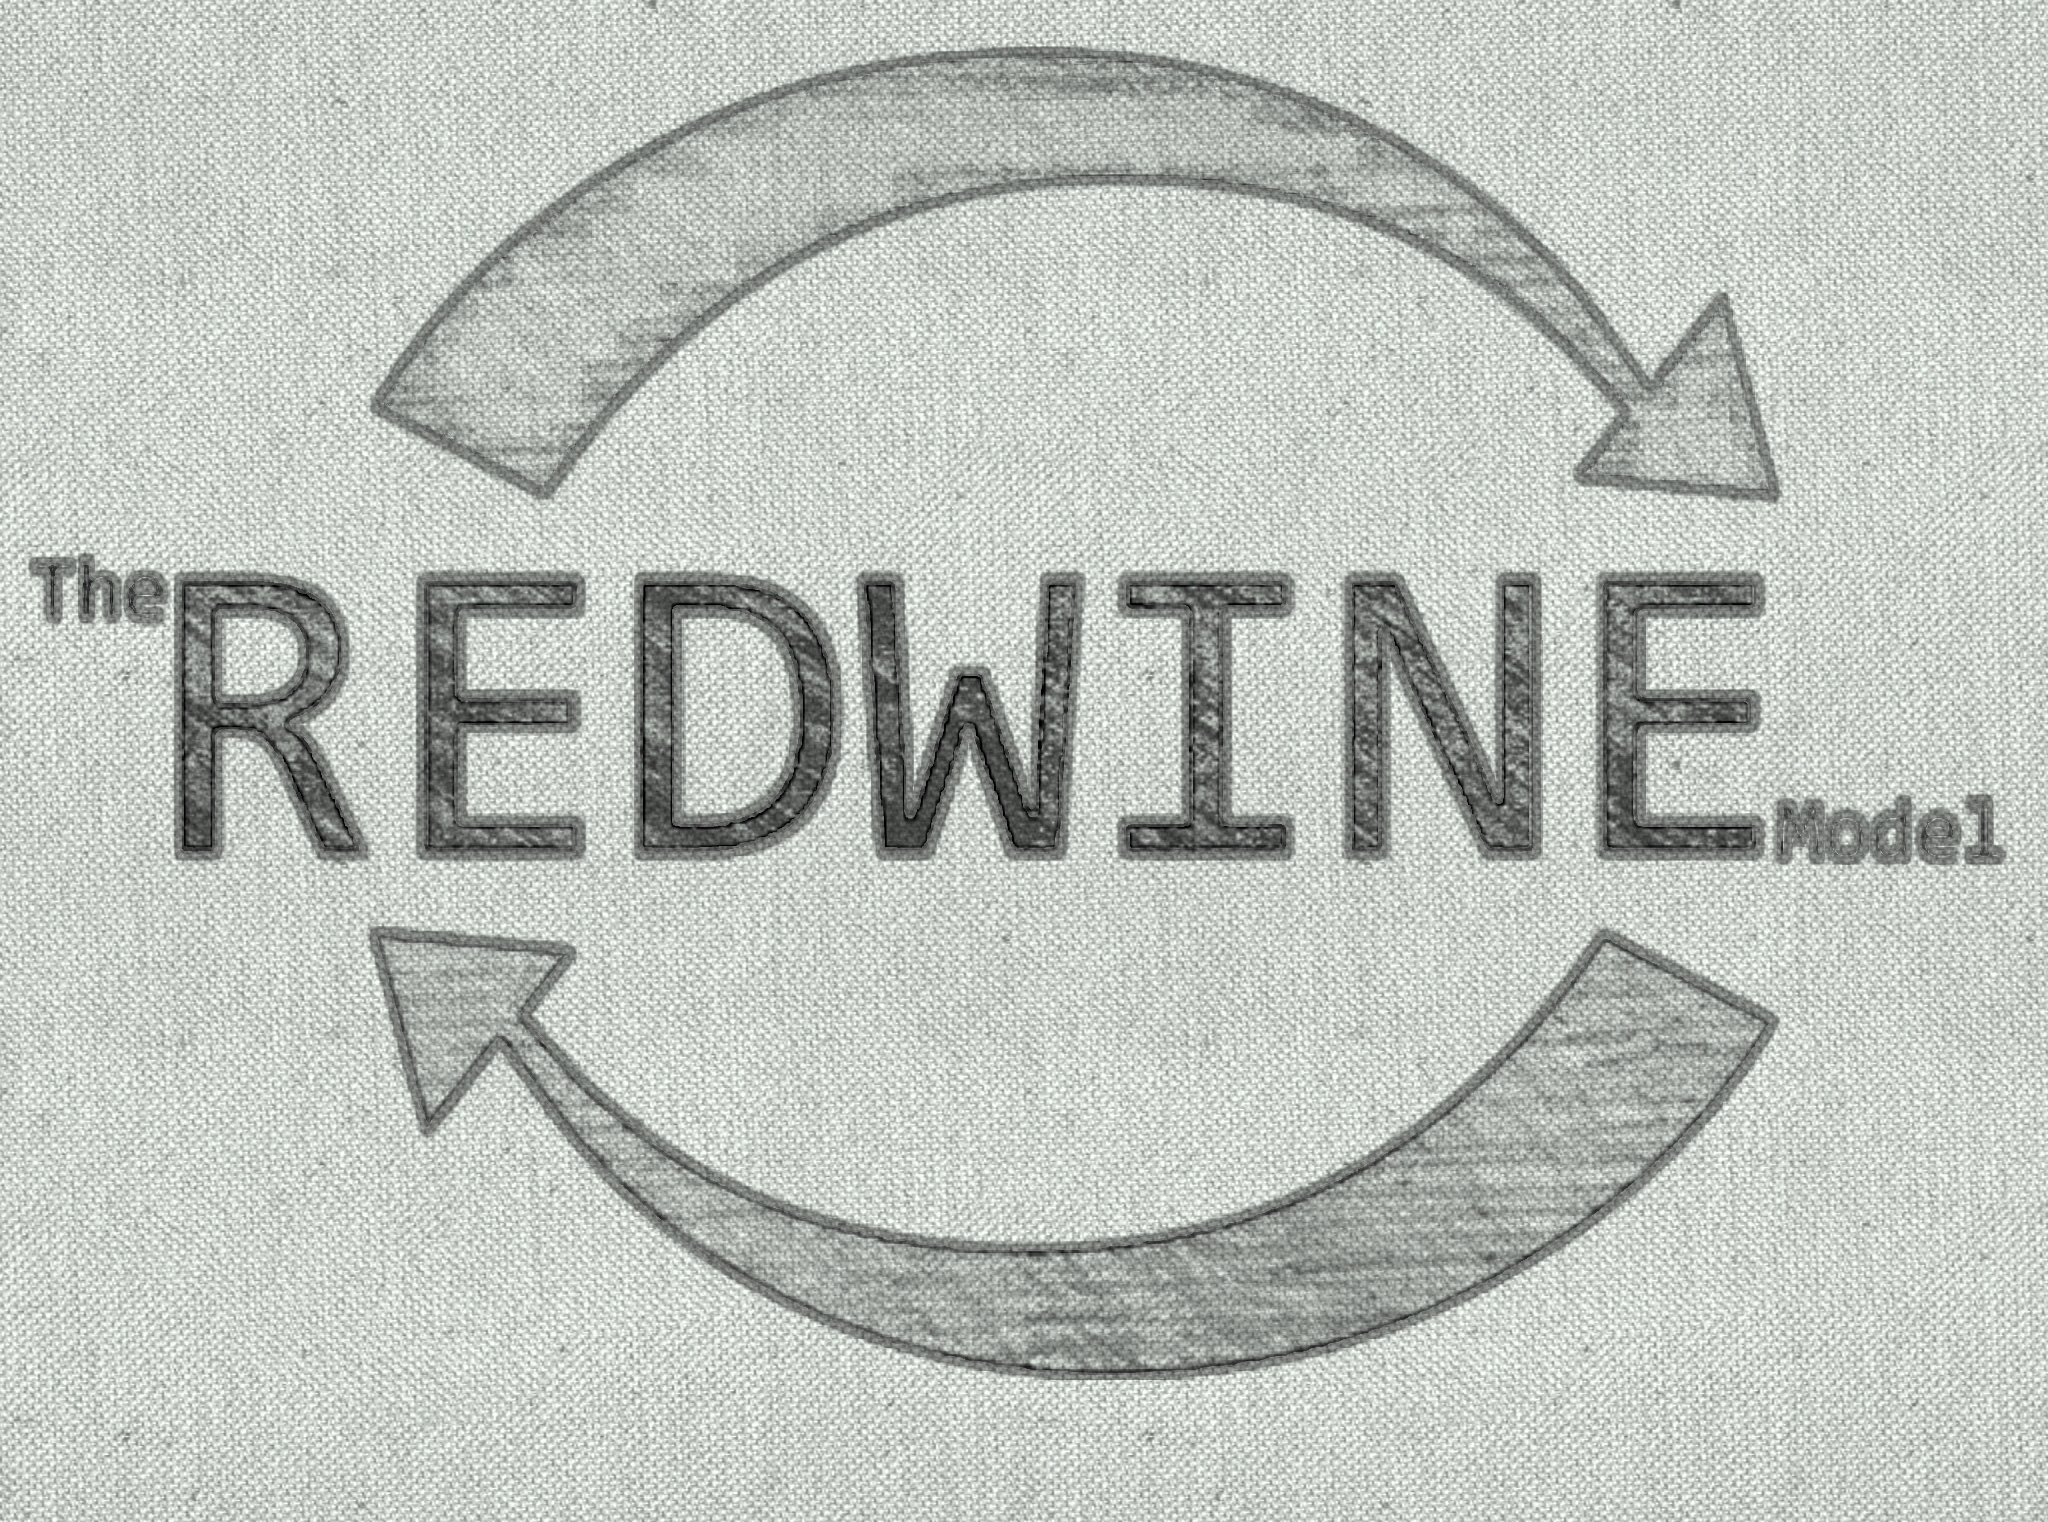 The Redwine Model